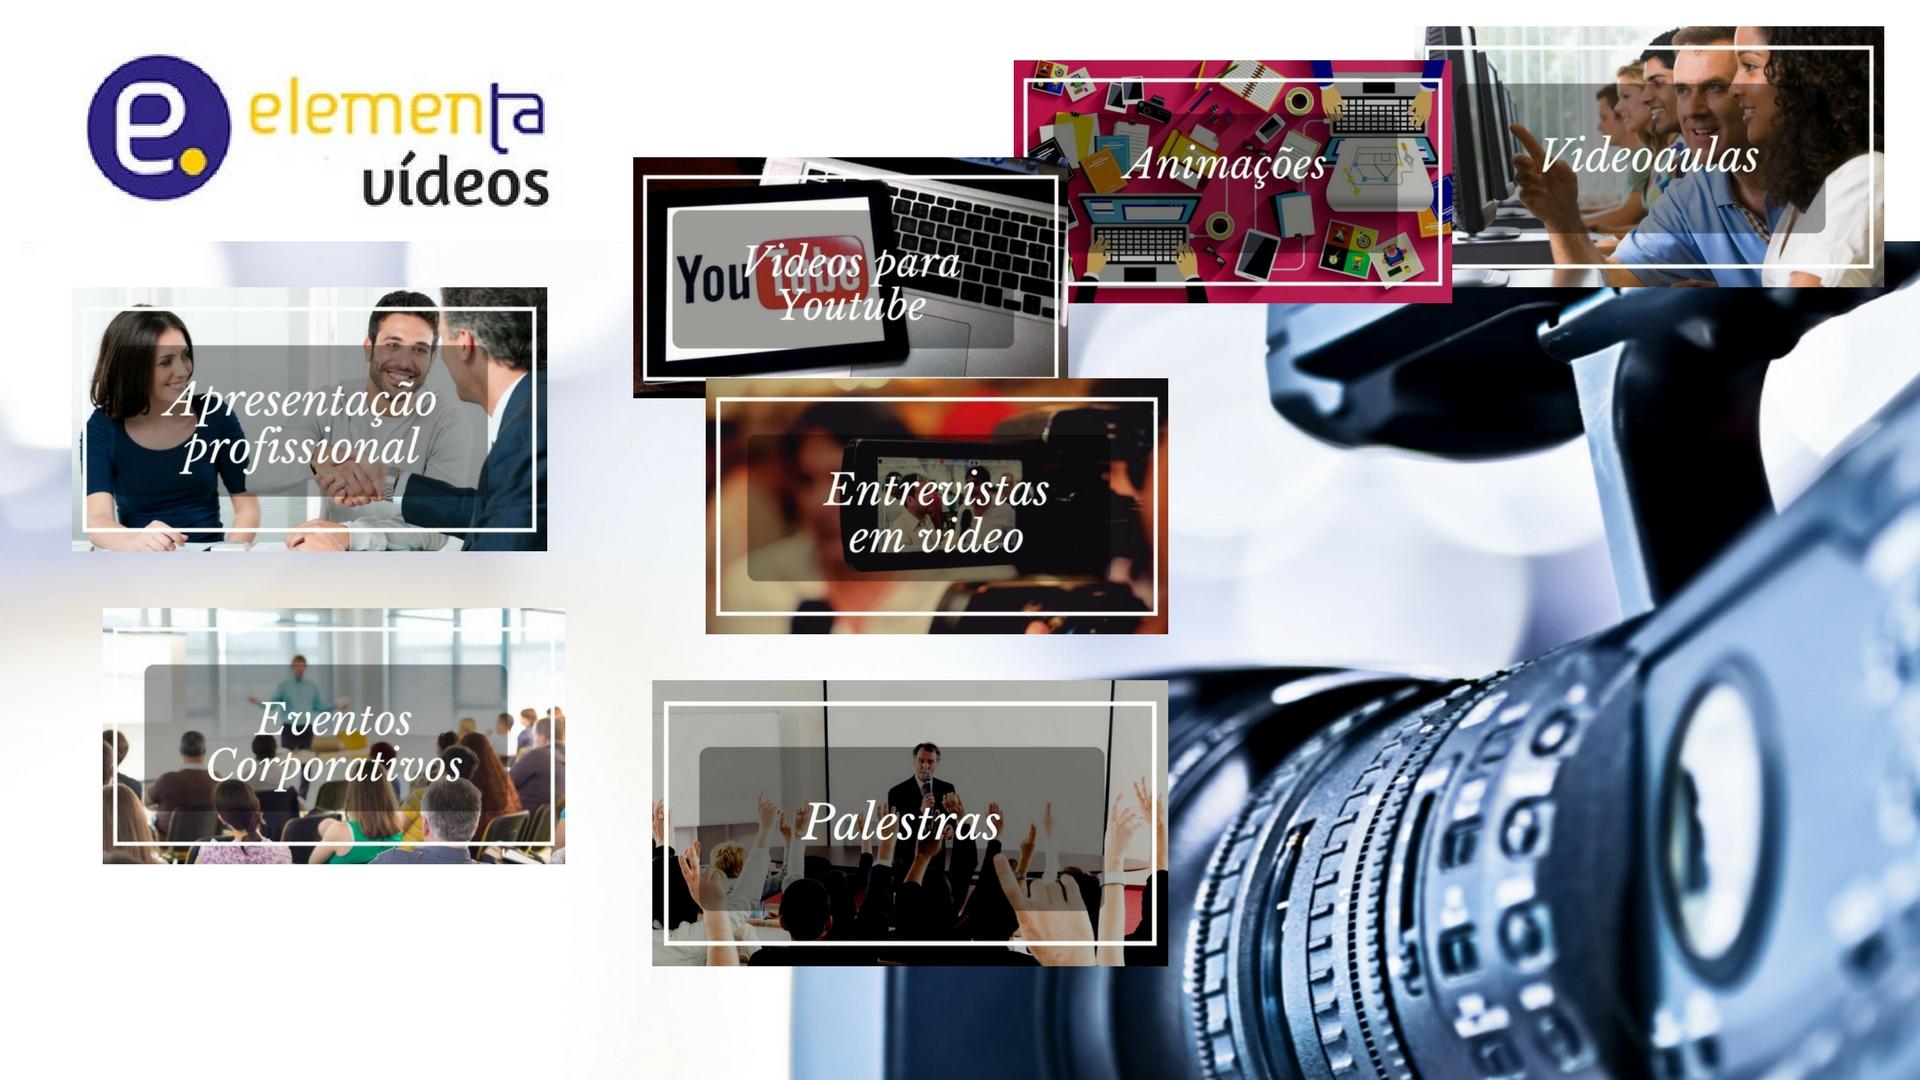 Videos Elementa